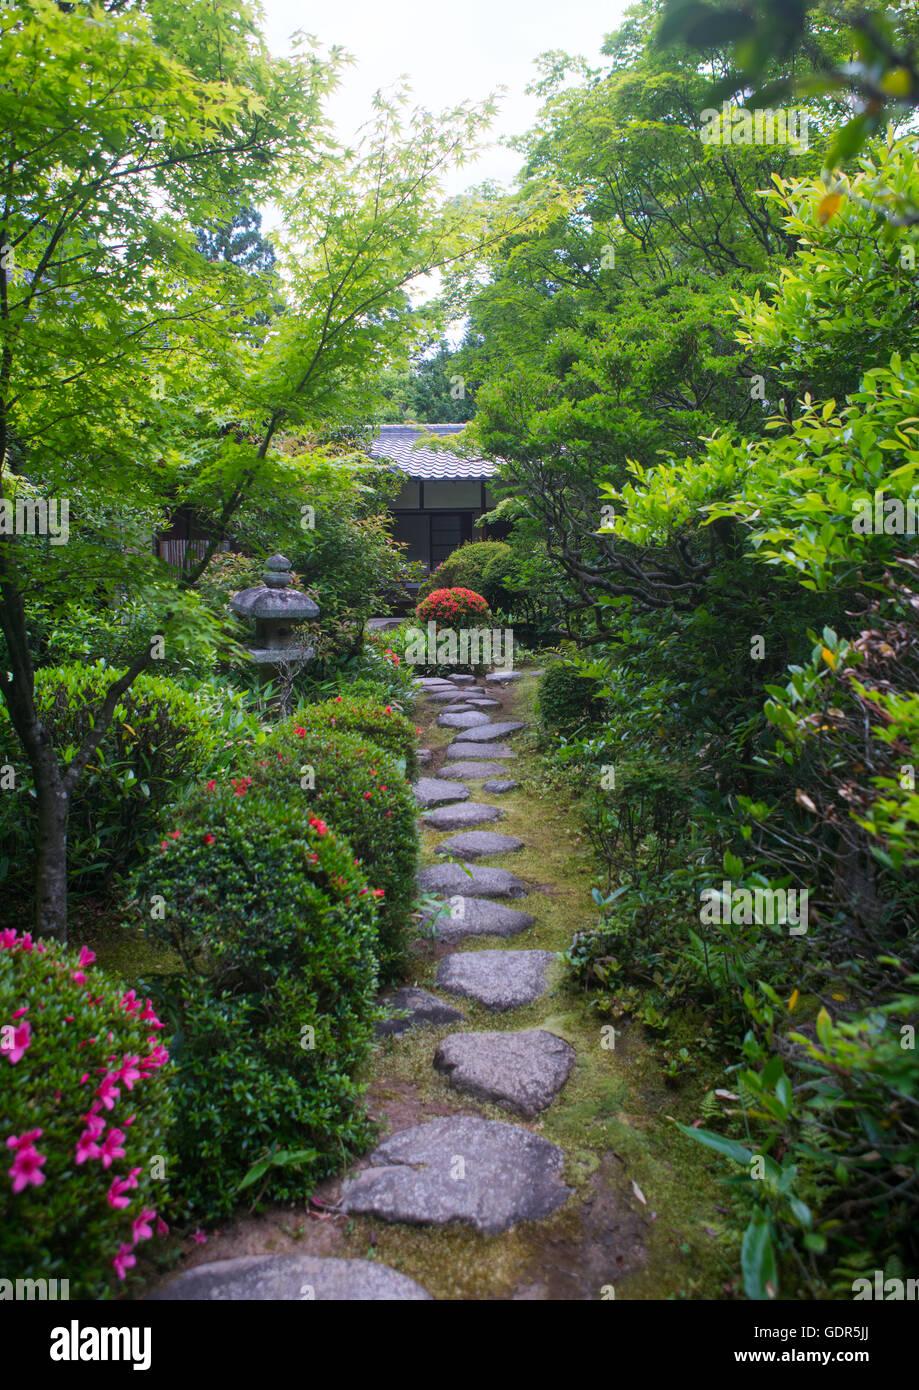 Garden in koto-in zen buddhist temple in daitoku-ji, Kansai region, Kyoto, Japan - Stock Image